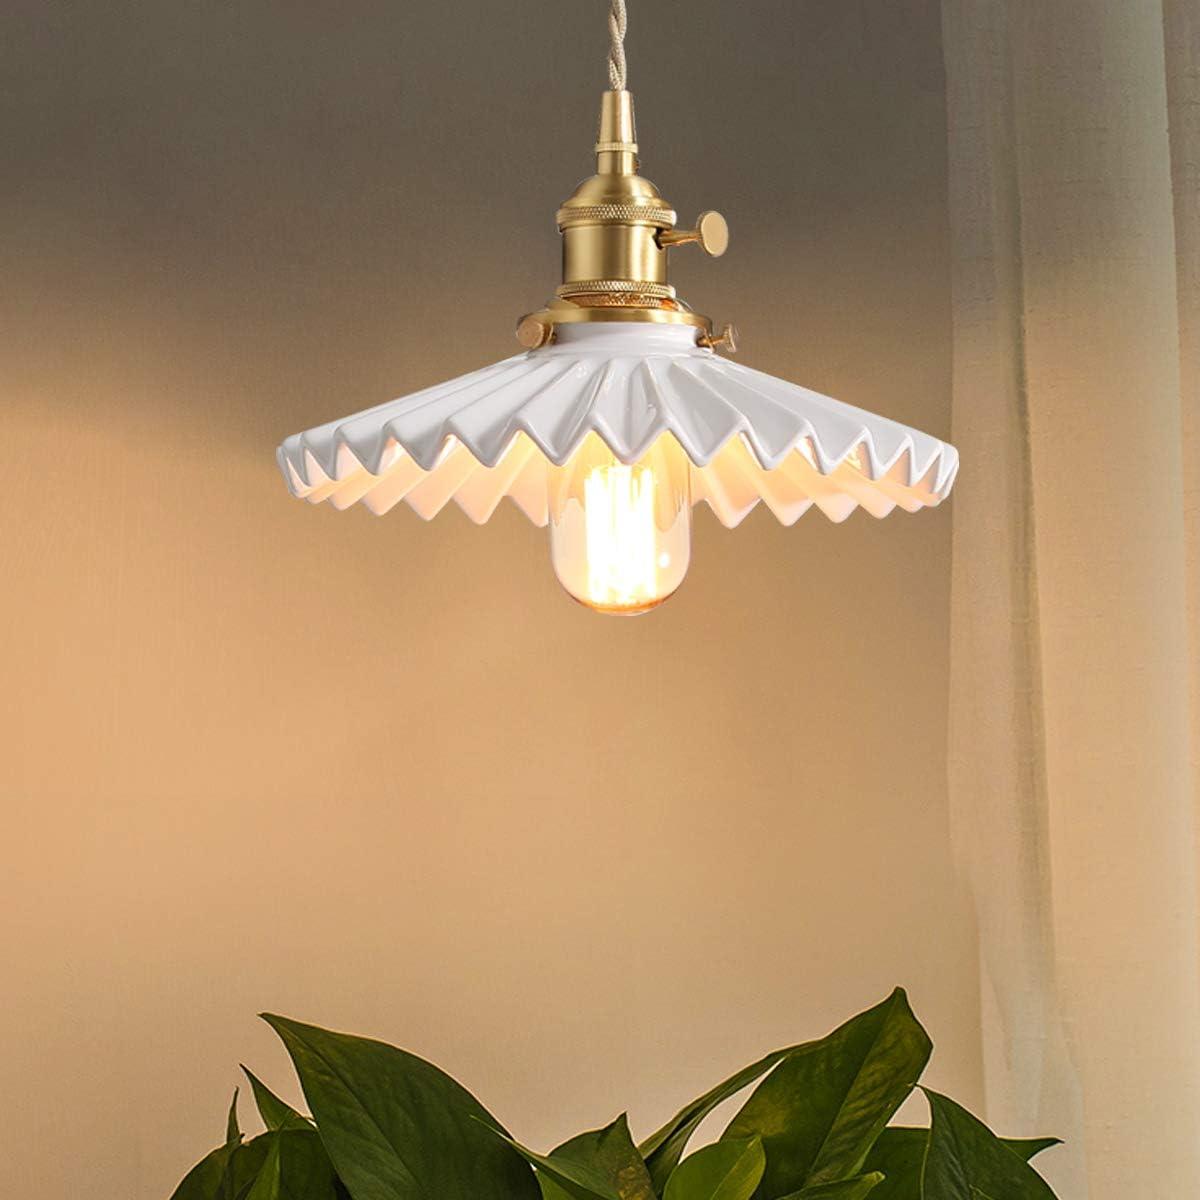 VISDANFO Copper Pendant Light Fixture for Living Room Dining Room Bedroom Kitchen.